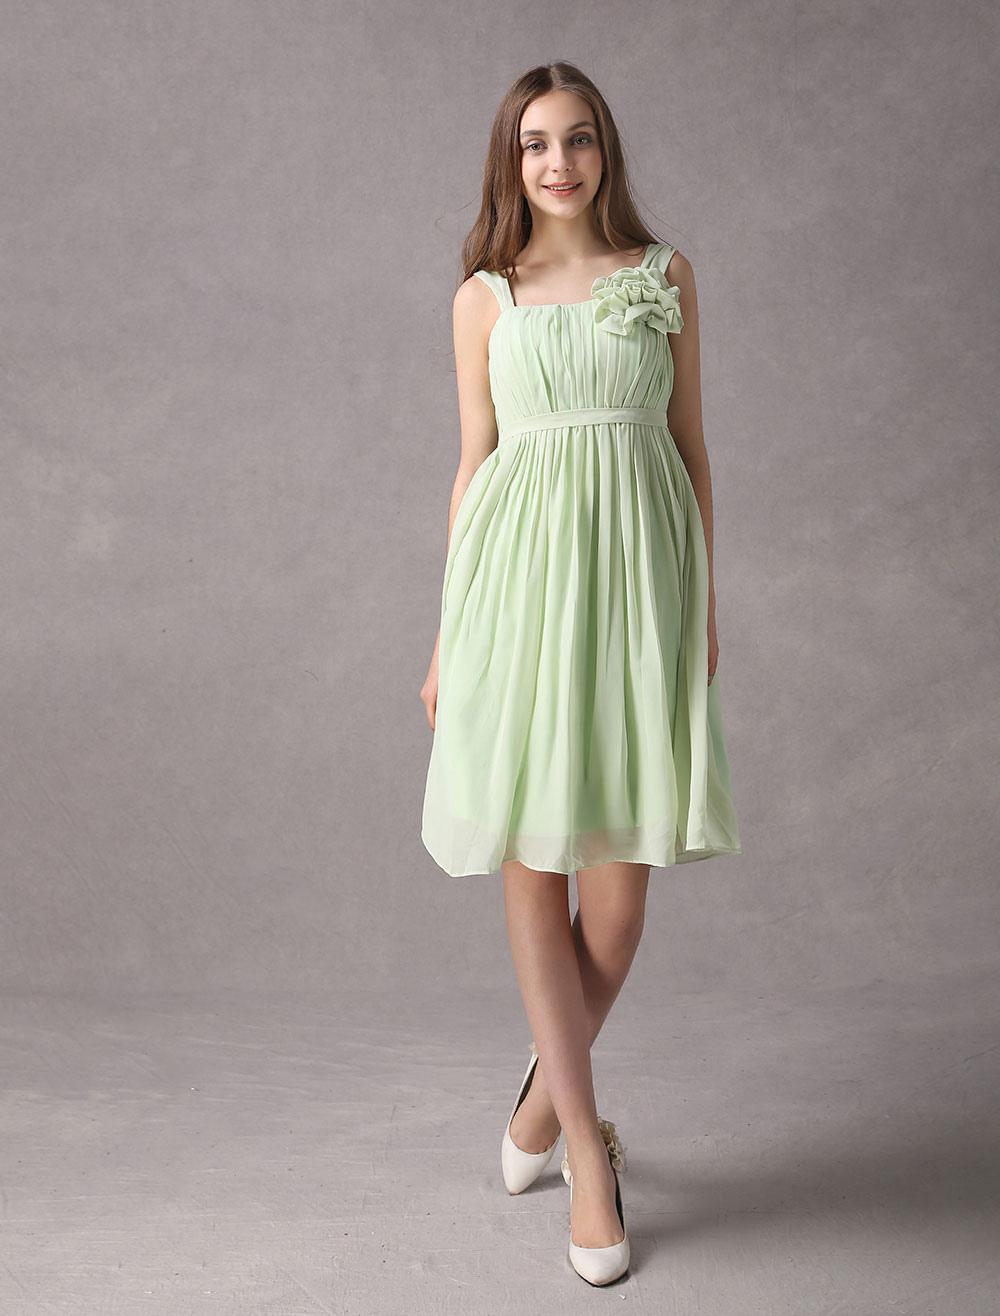 Sage Green Bridesmaid Dress Square Neckline A Line Chiffon Short Wedding Party Dress